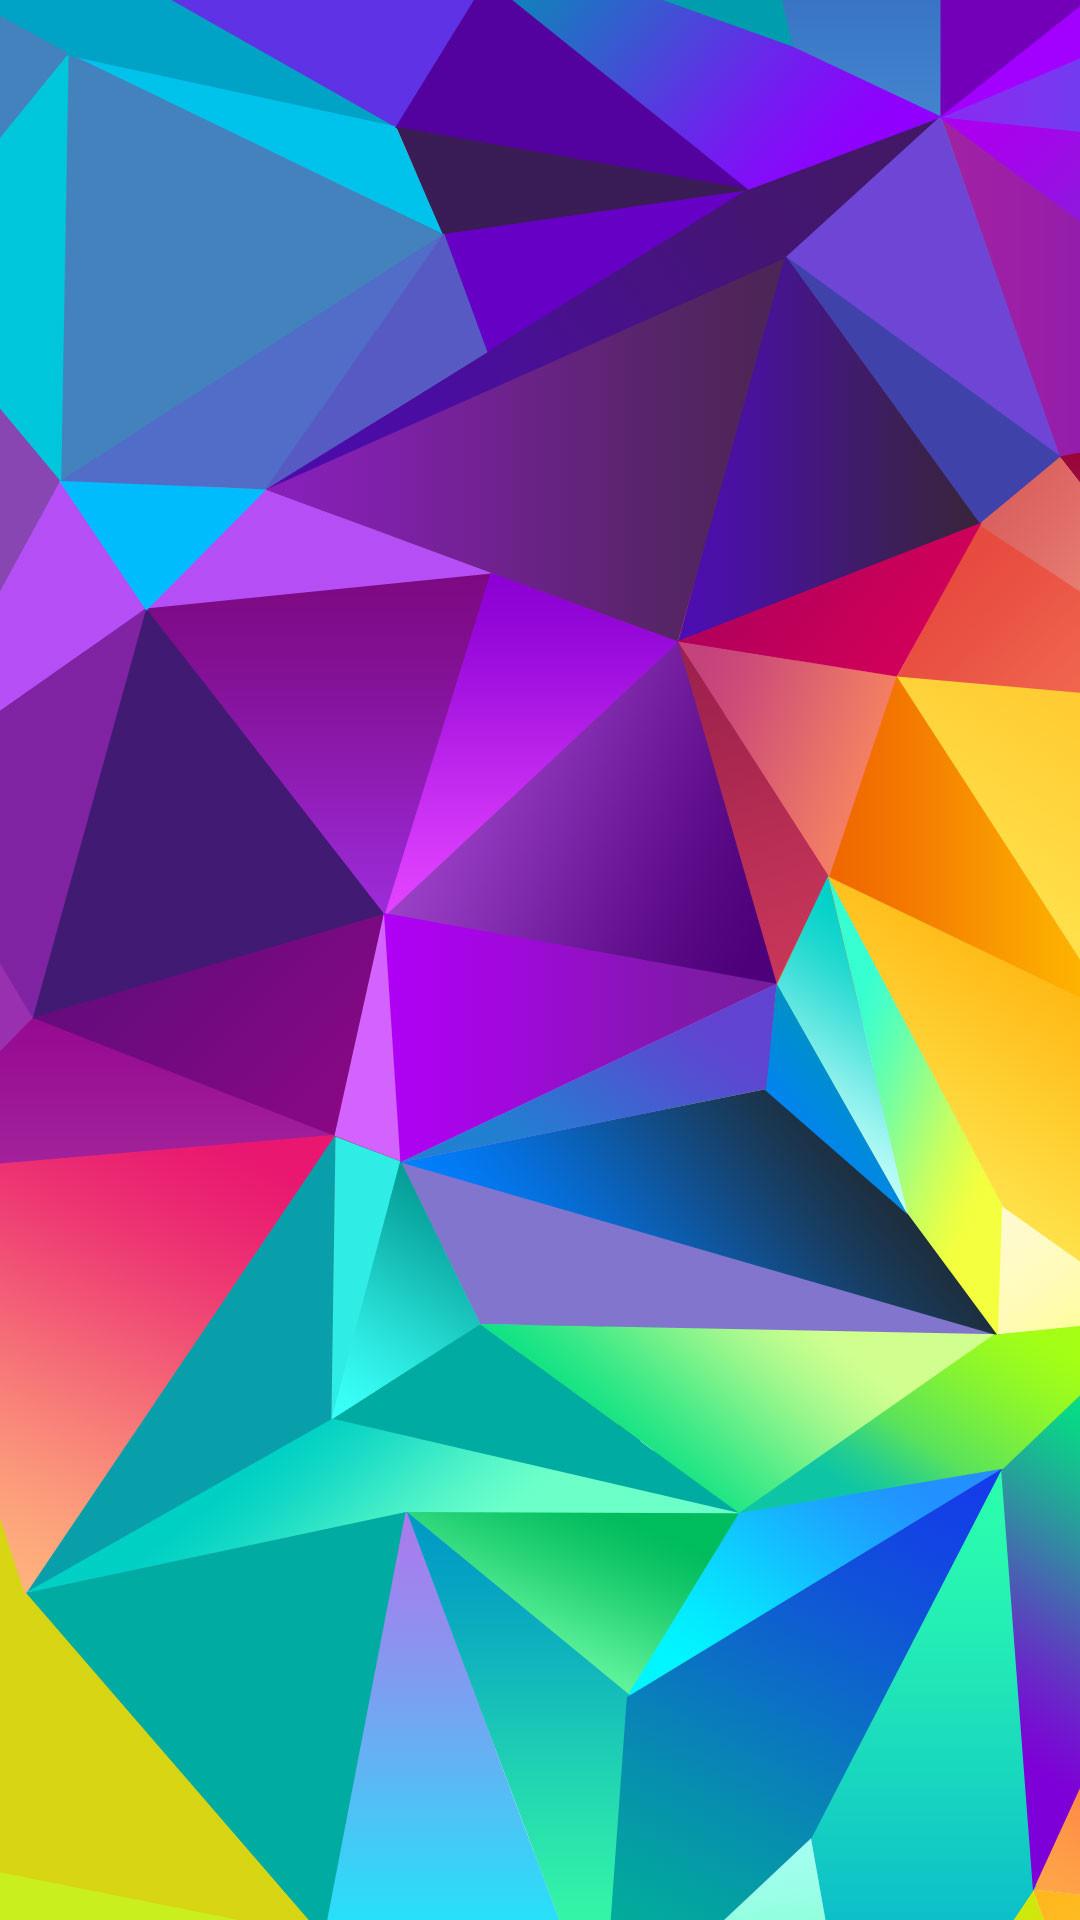 Colorful 3d Design Wallpaper